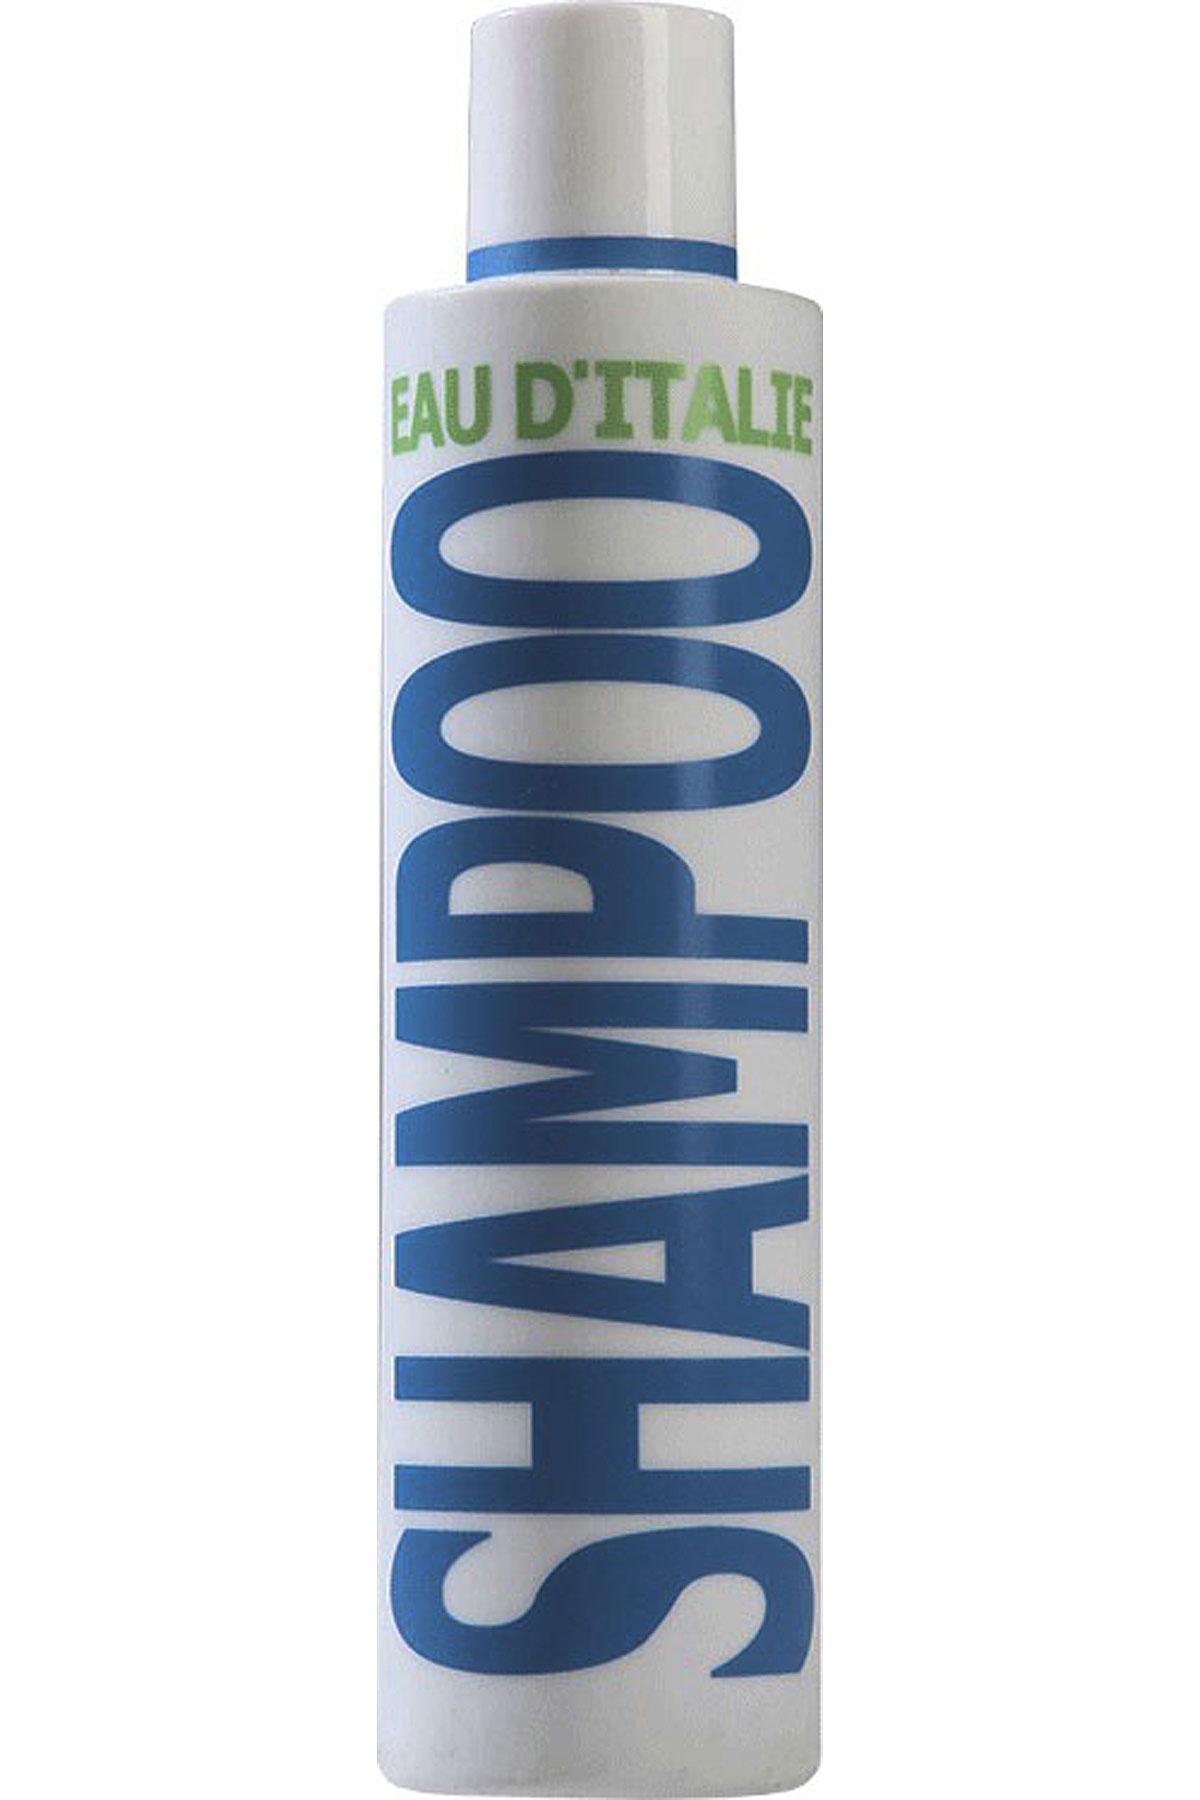 Eau D Italie Beauty for Men, Eau D Italie - Shampoo - 200 Ml, 2019, 200 ml